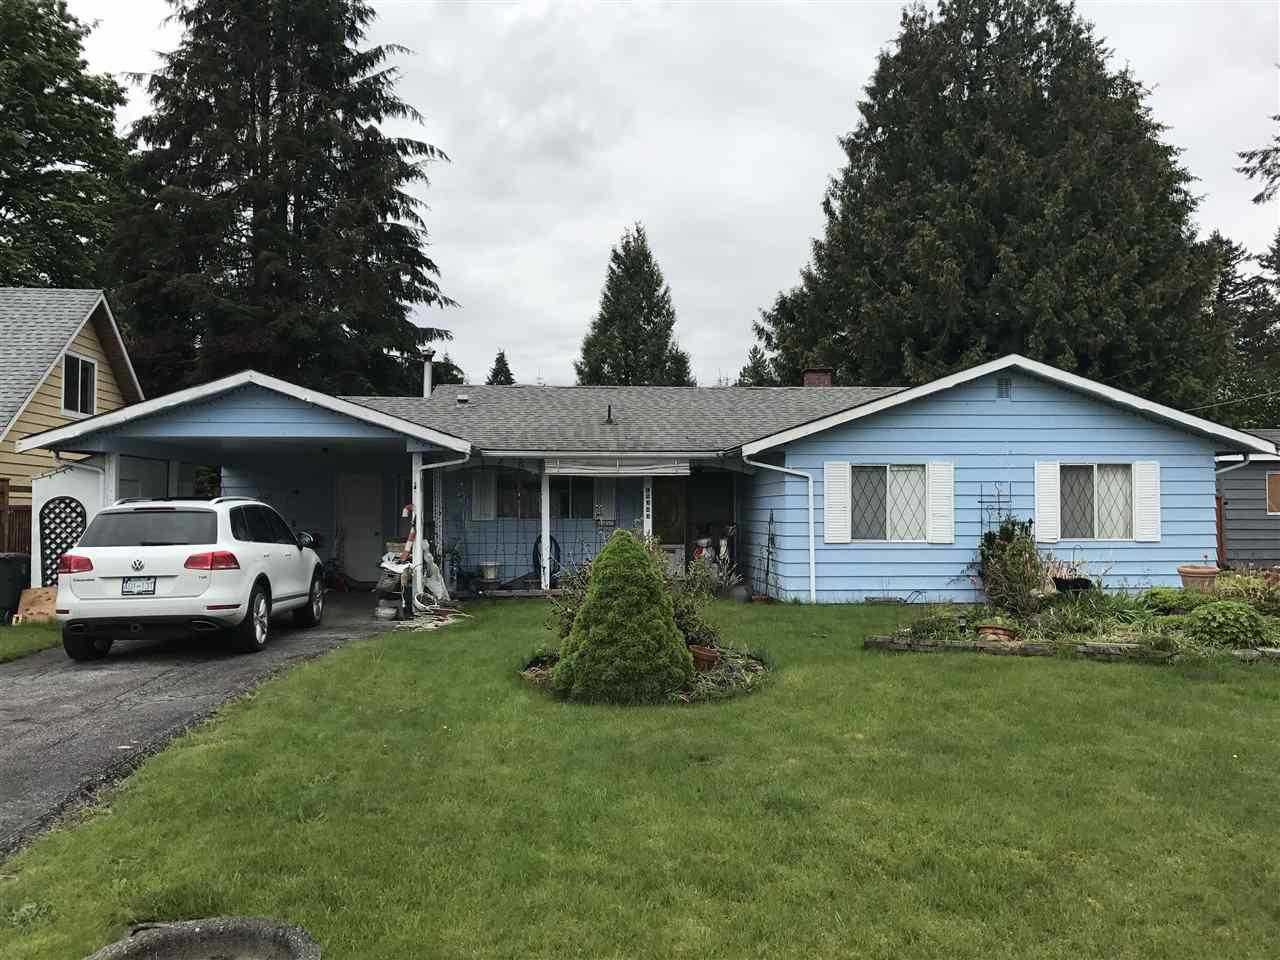 Main Photo: 19343 119B Avenue in Pitt Meadows: Central Meadows House for sale : MLS®# R2170388